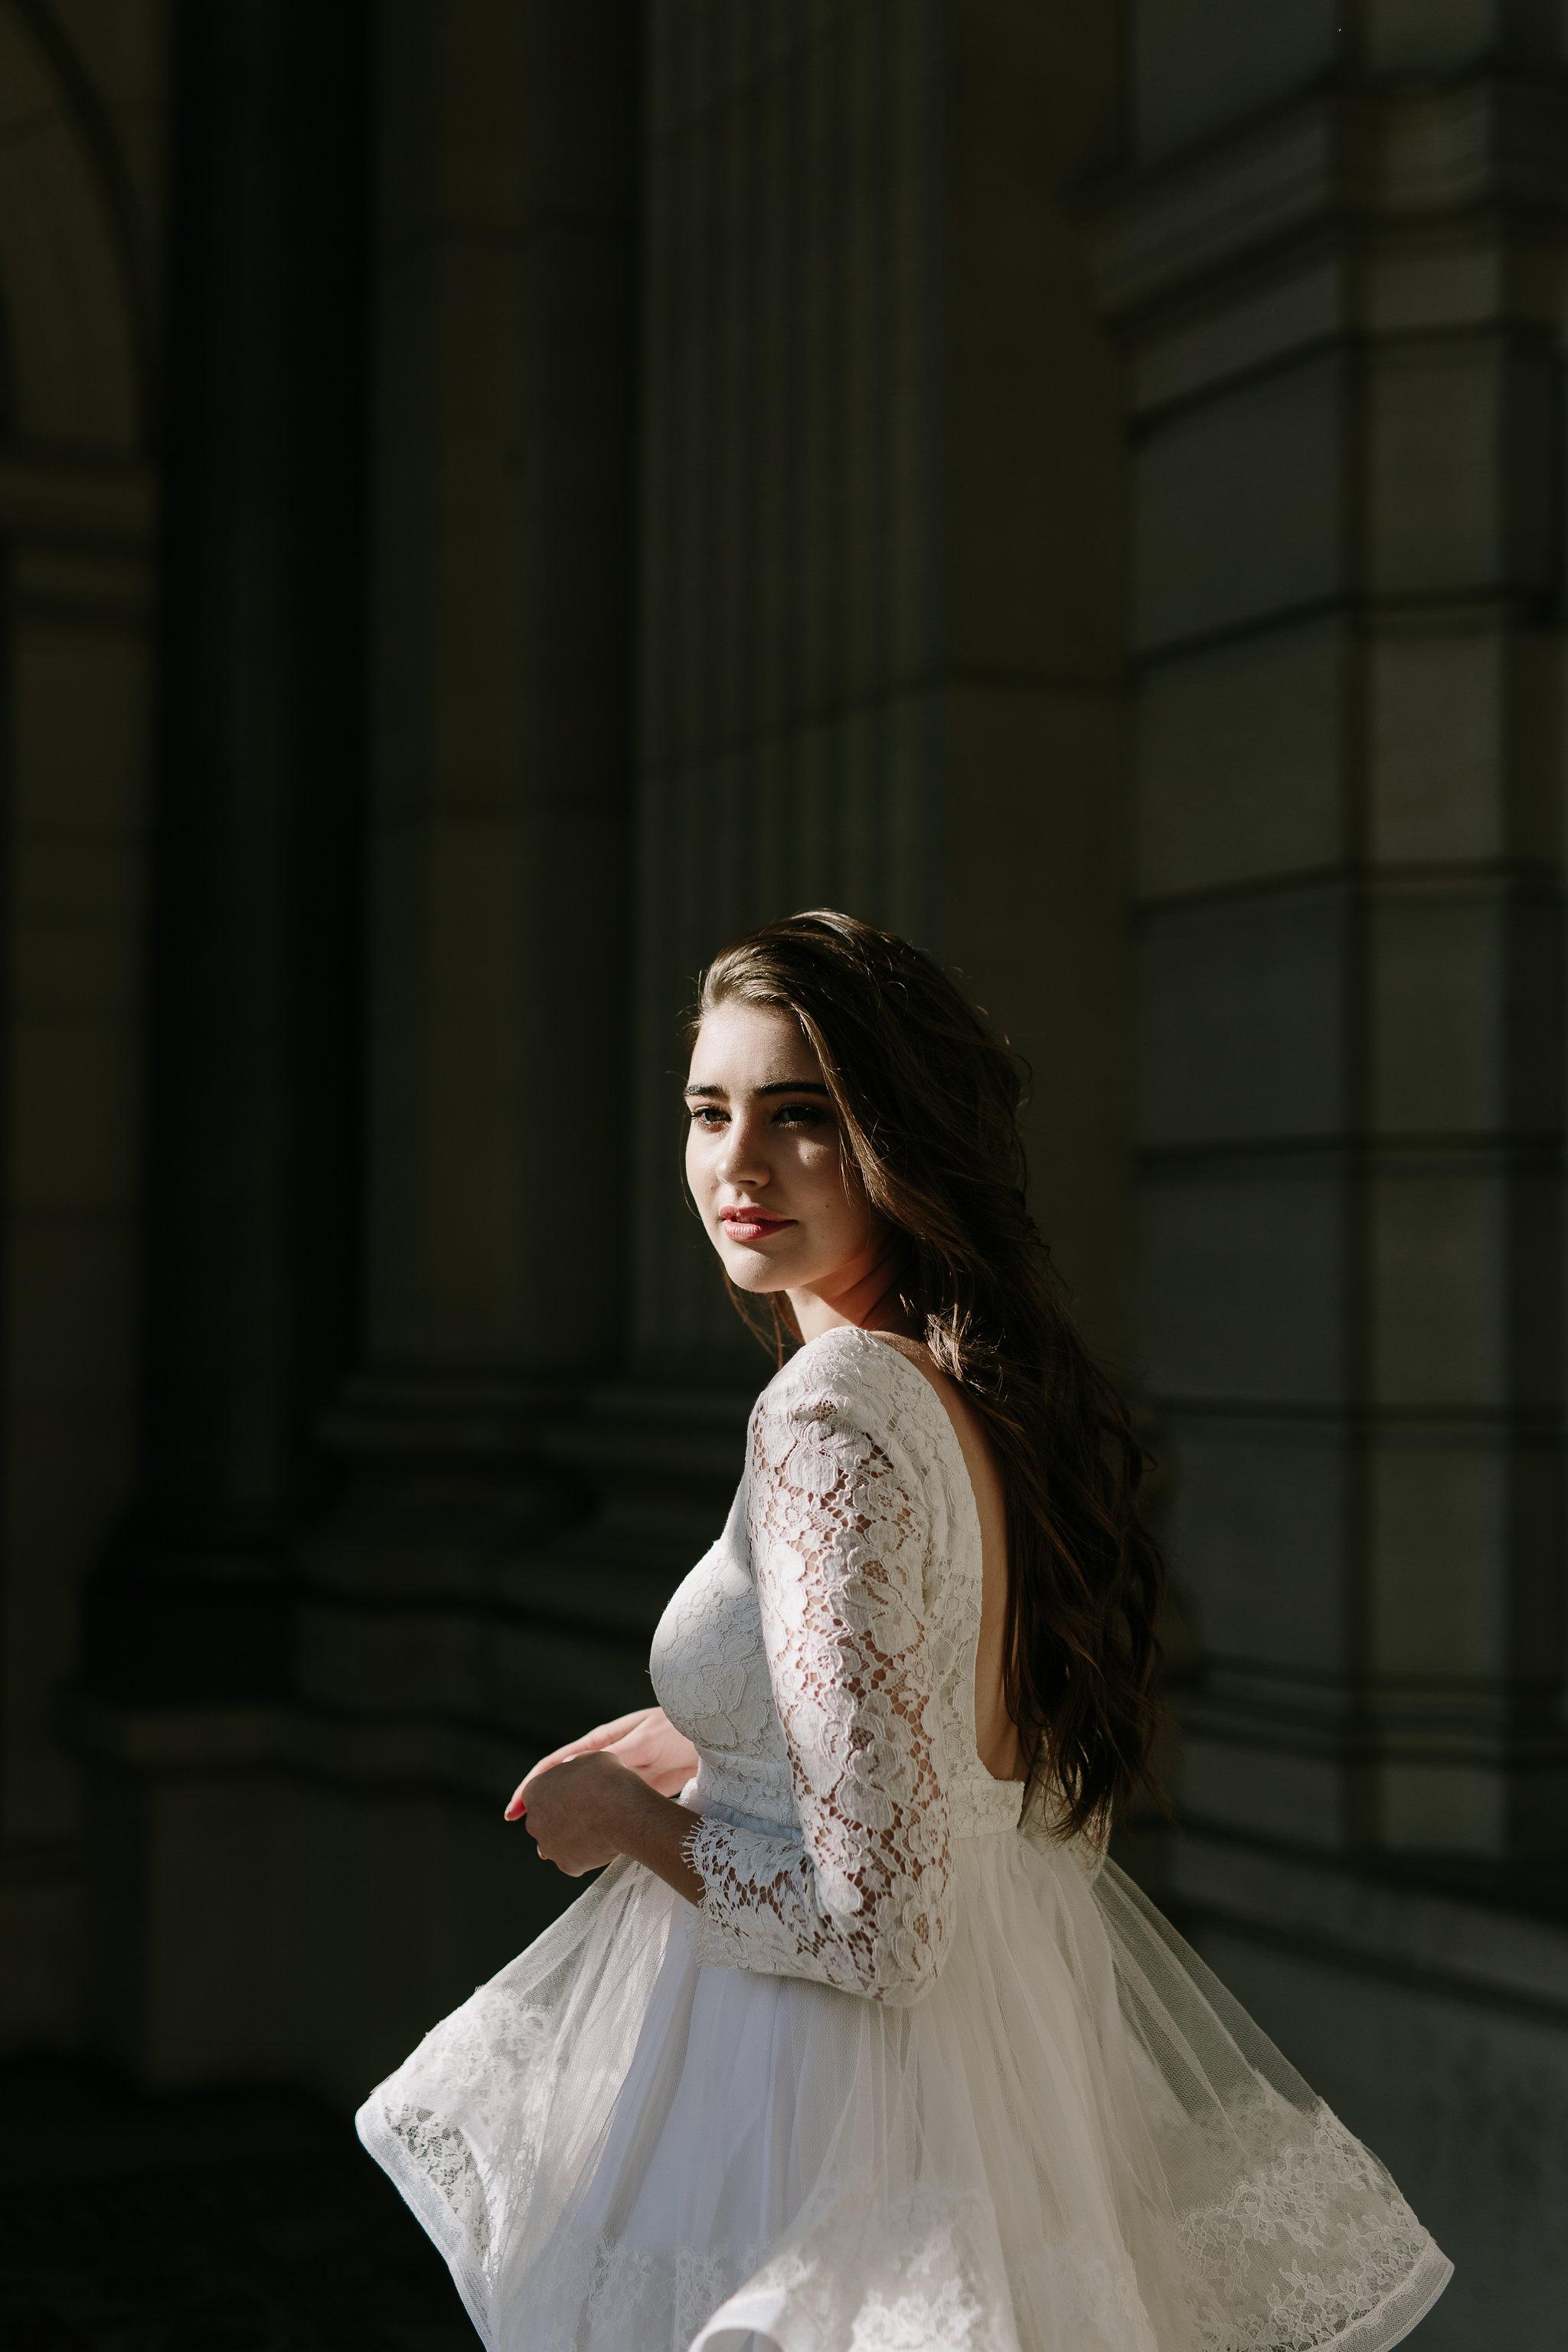 Italia Wedding Editorial Photoshoot Bride